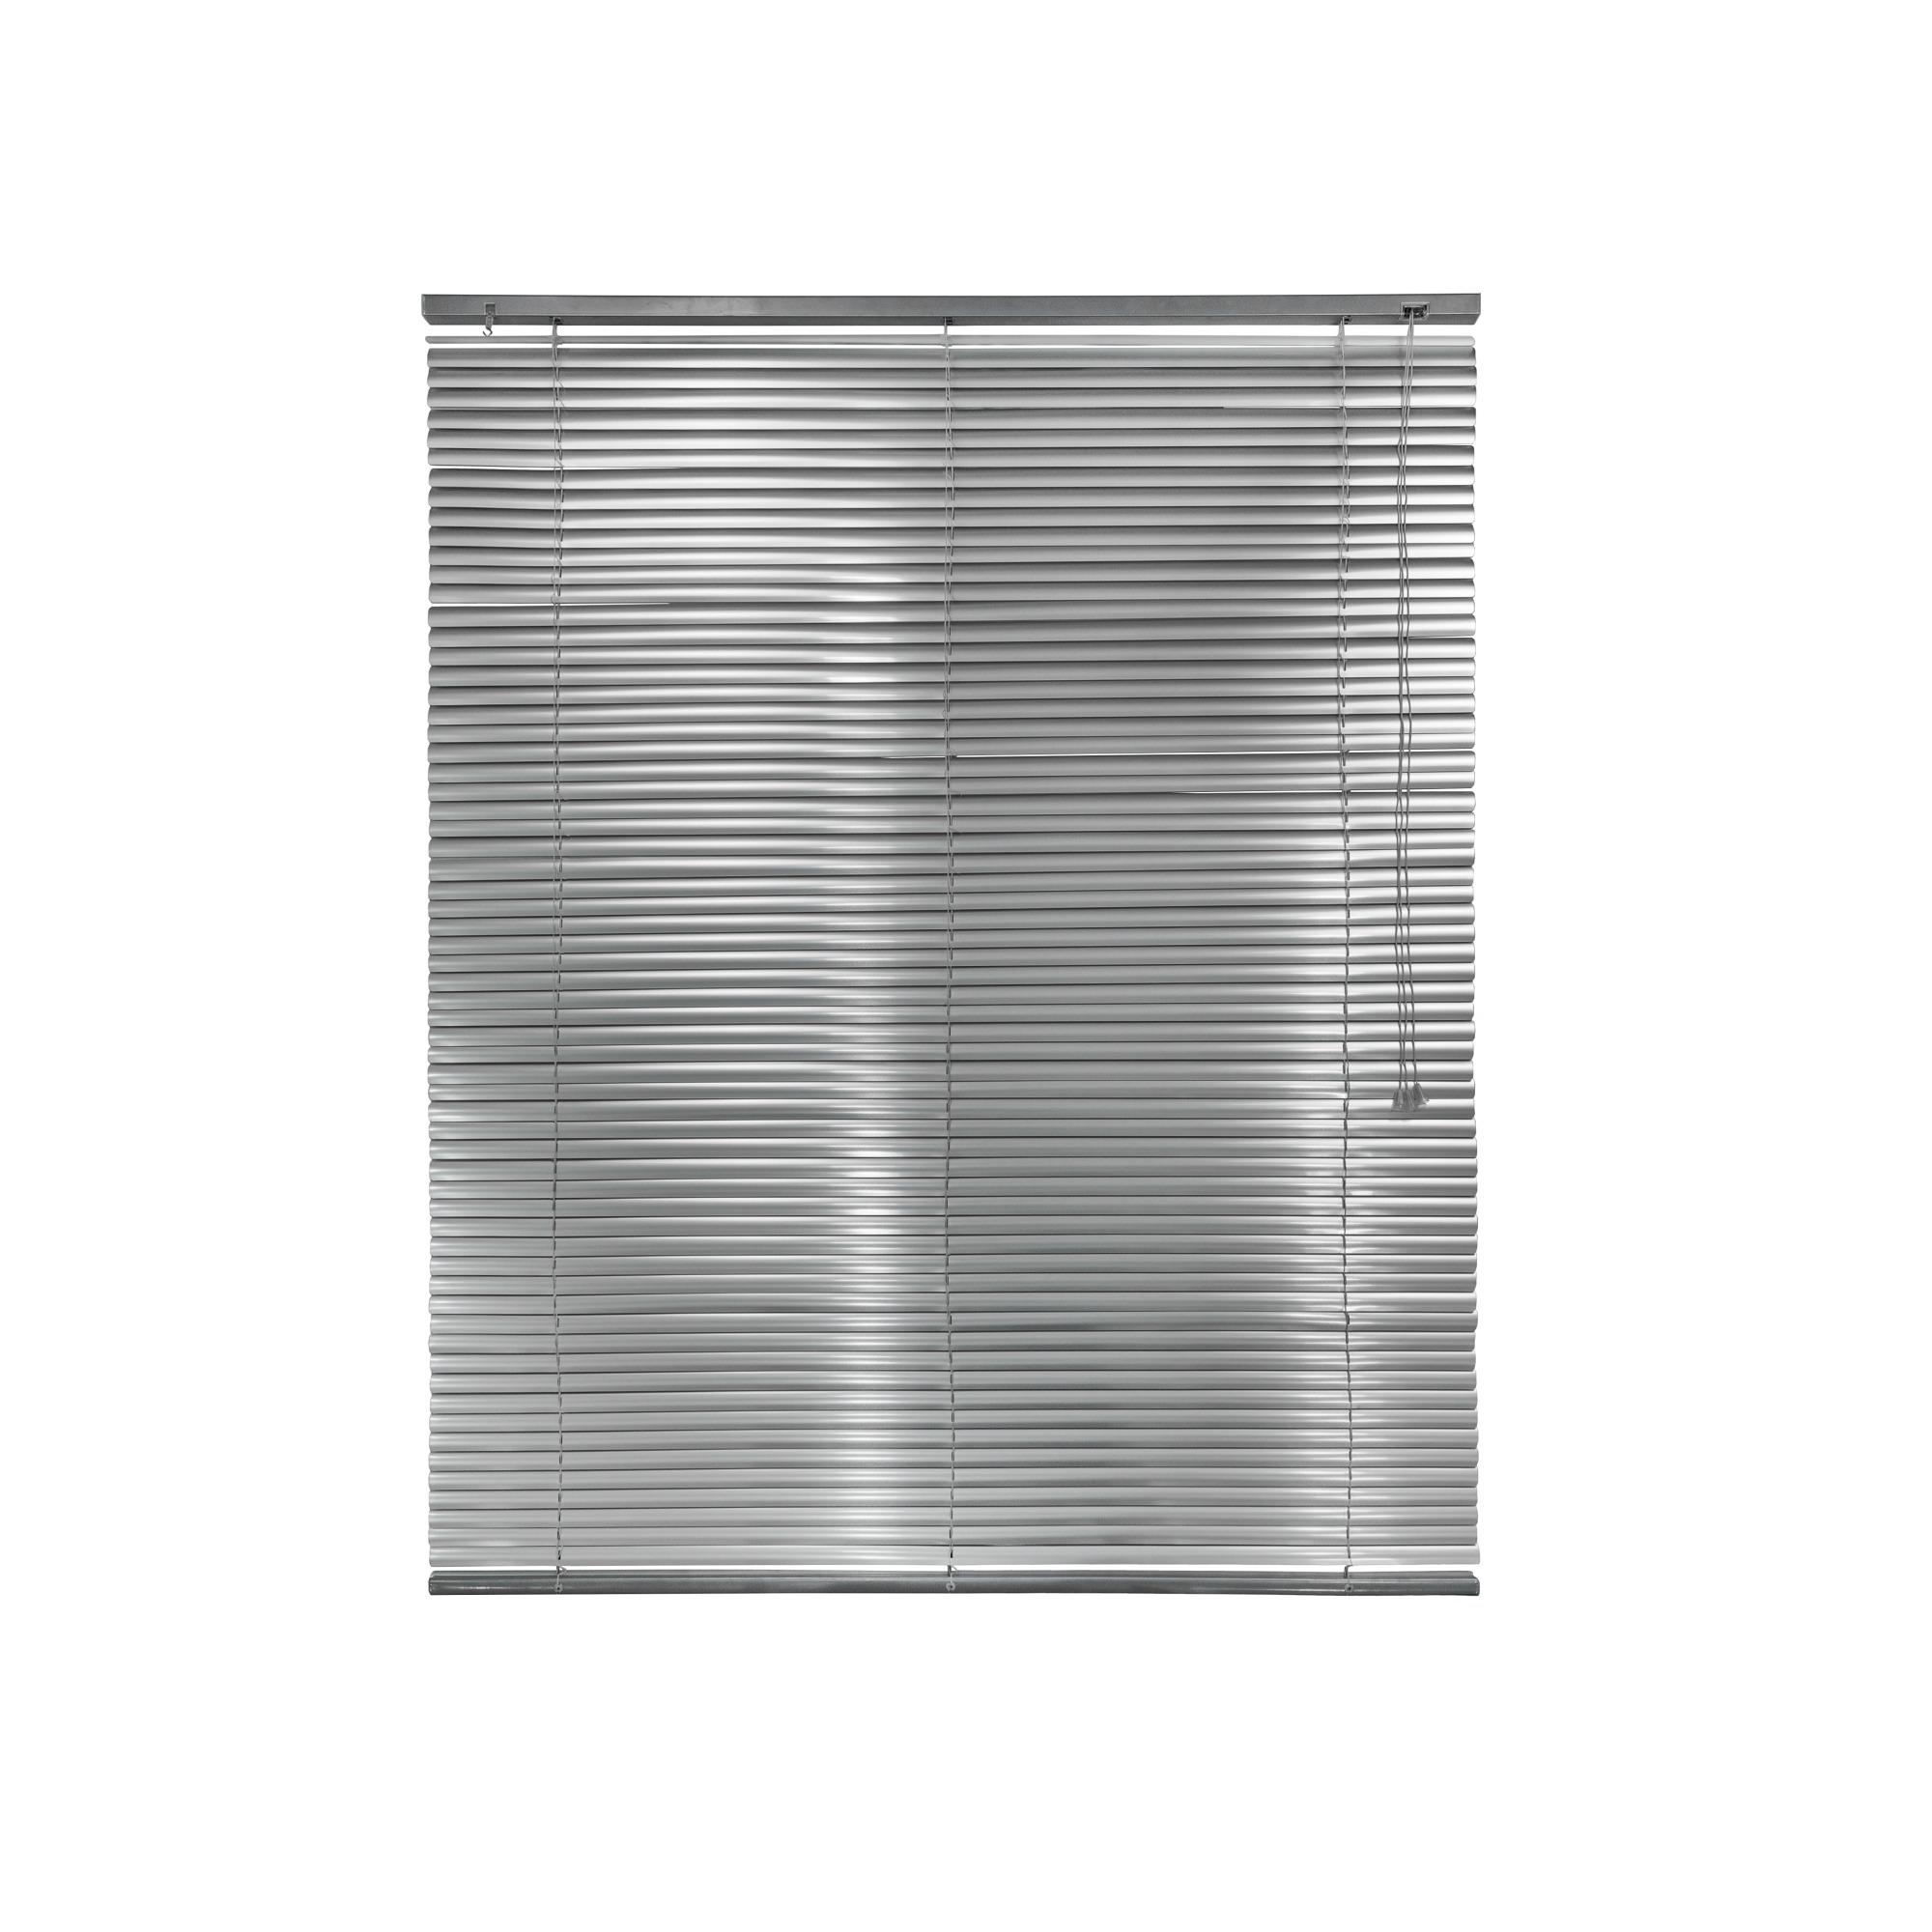 Persiana Horizontal Aluminio 160x150 cm Prata - Liyang